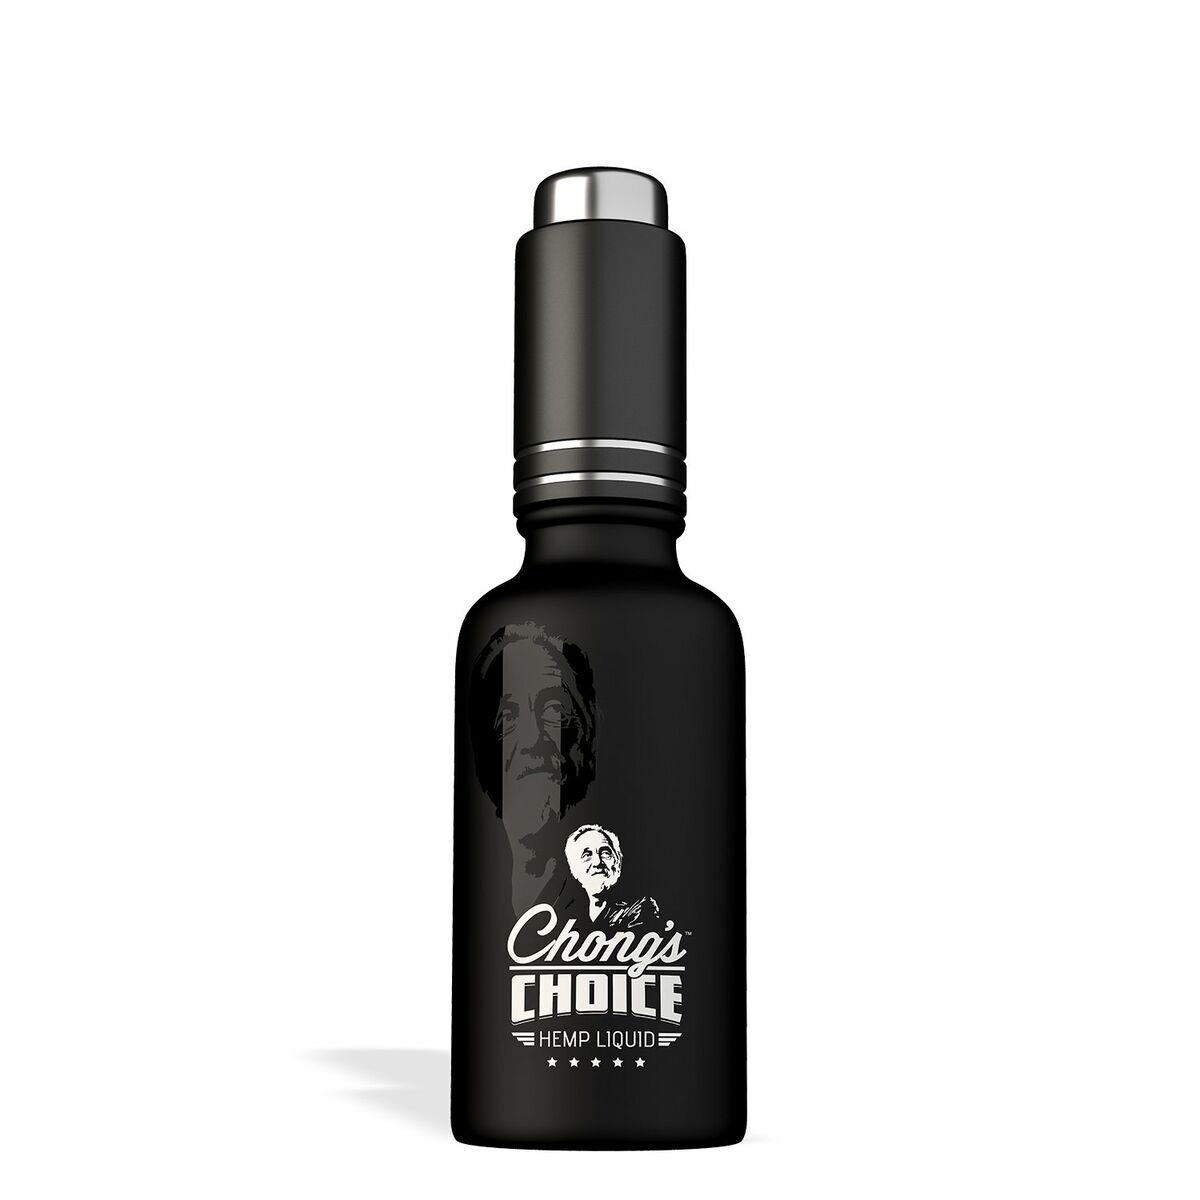 Chong's Choice, CBD Oil, Vapor Liquid or Oral Drops, Broad Spectrum THC-Free, 1000mg CBD2